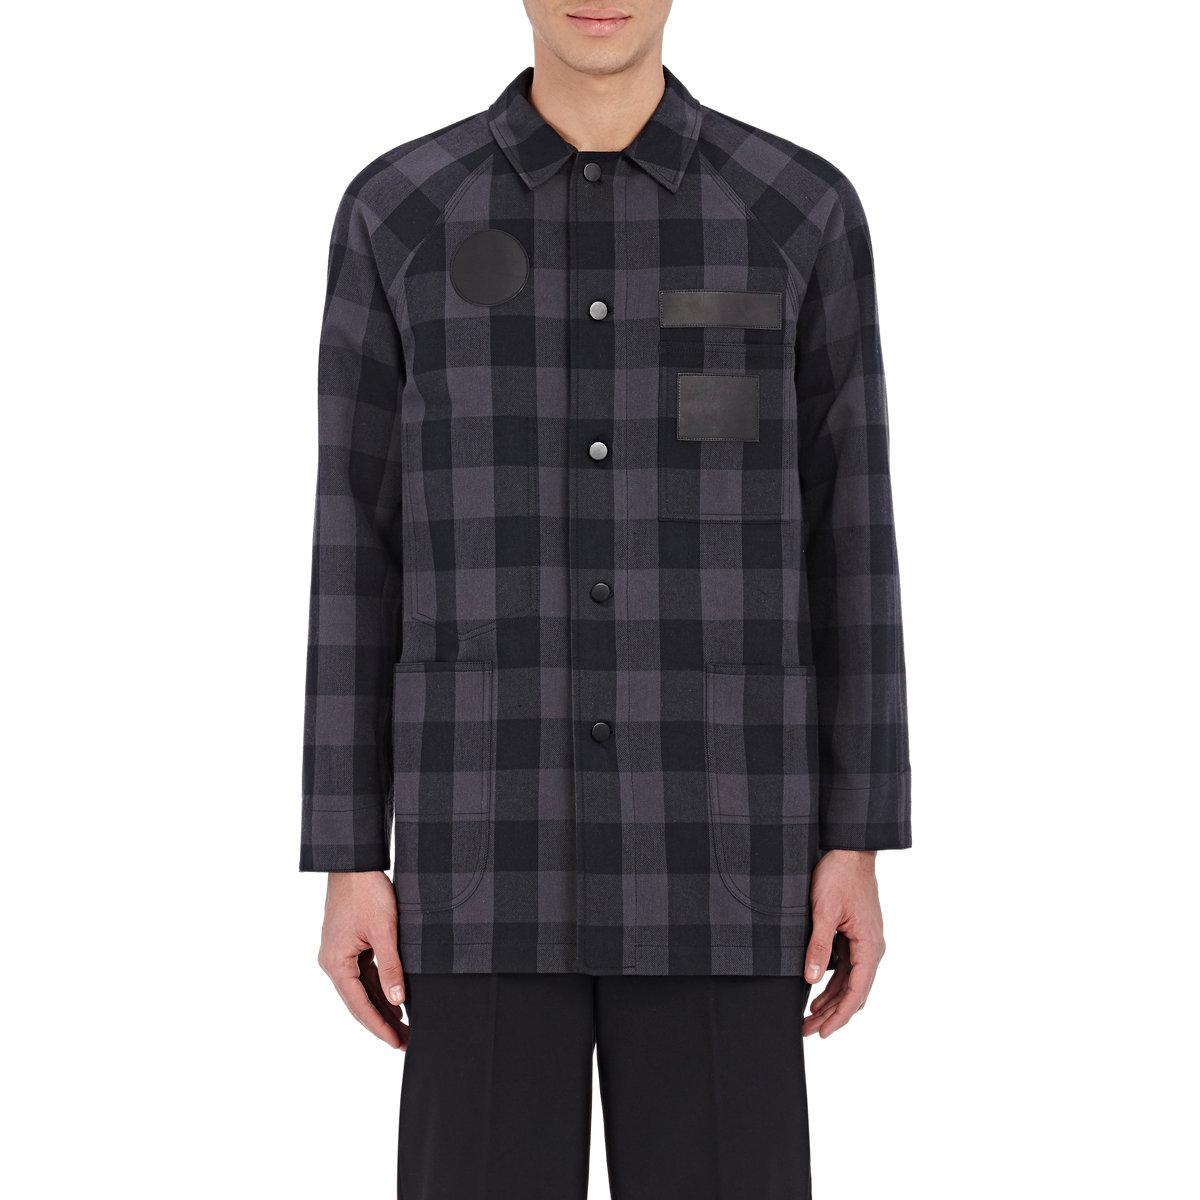 Alexander wang men 39 s plaid shirt jacket in blue for men lyst for Plaid shirt jacket mens